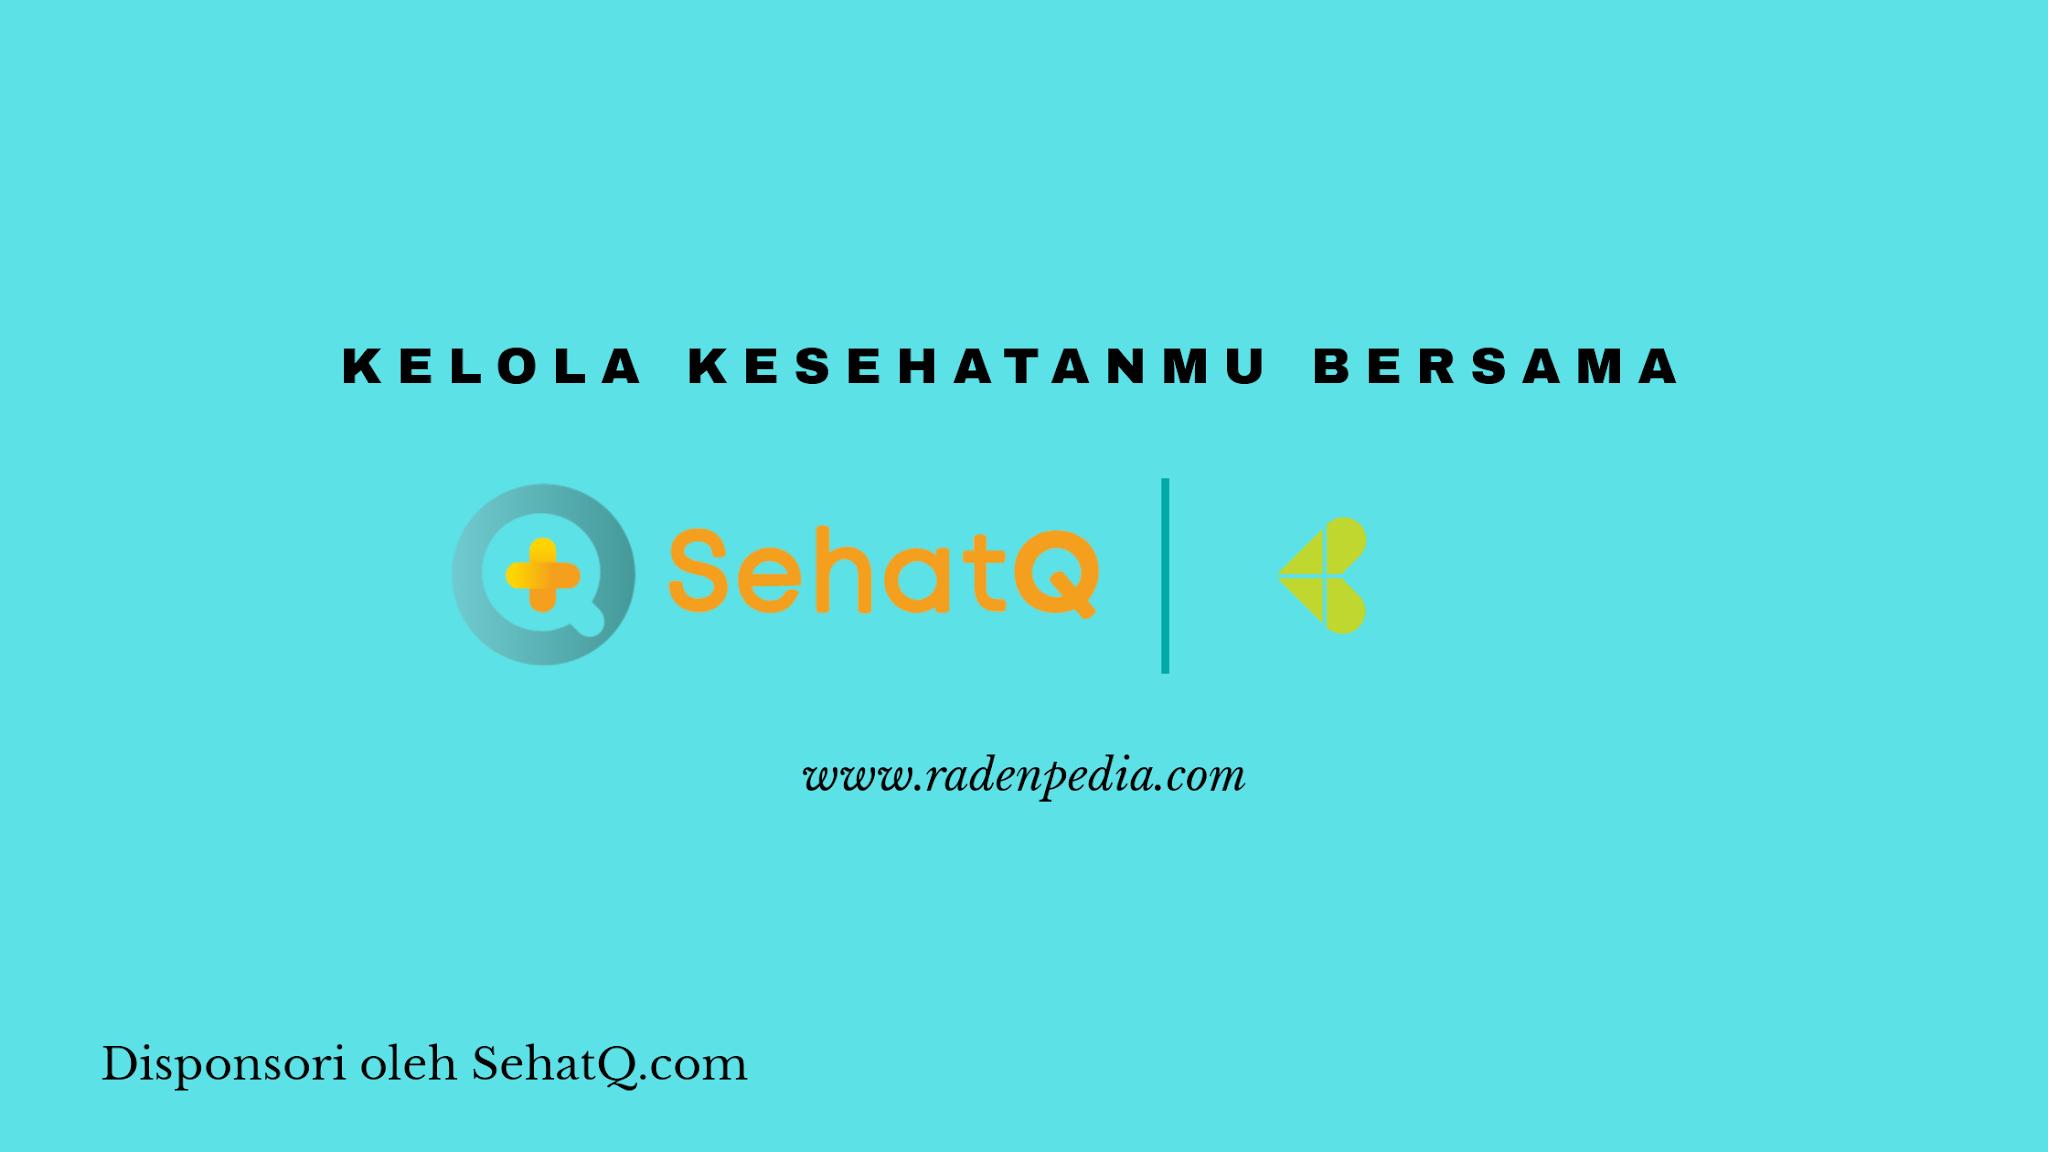 Kelola KesehatanMu Bersama SehatQ.com - www.radenpedia.com